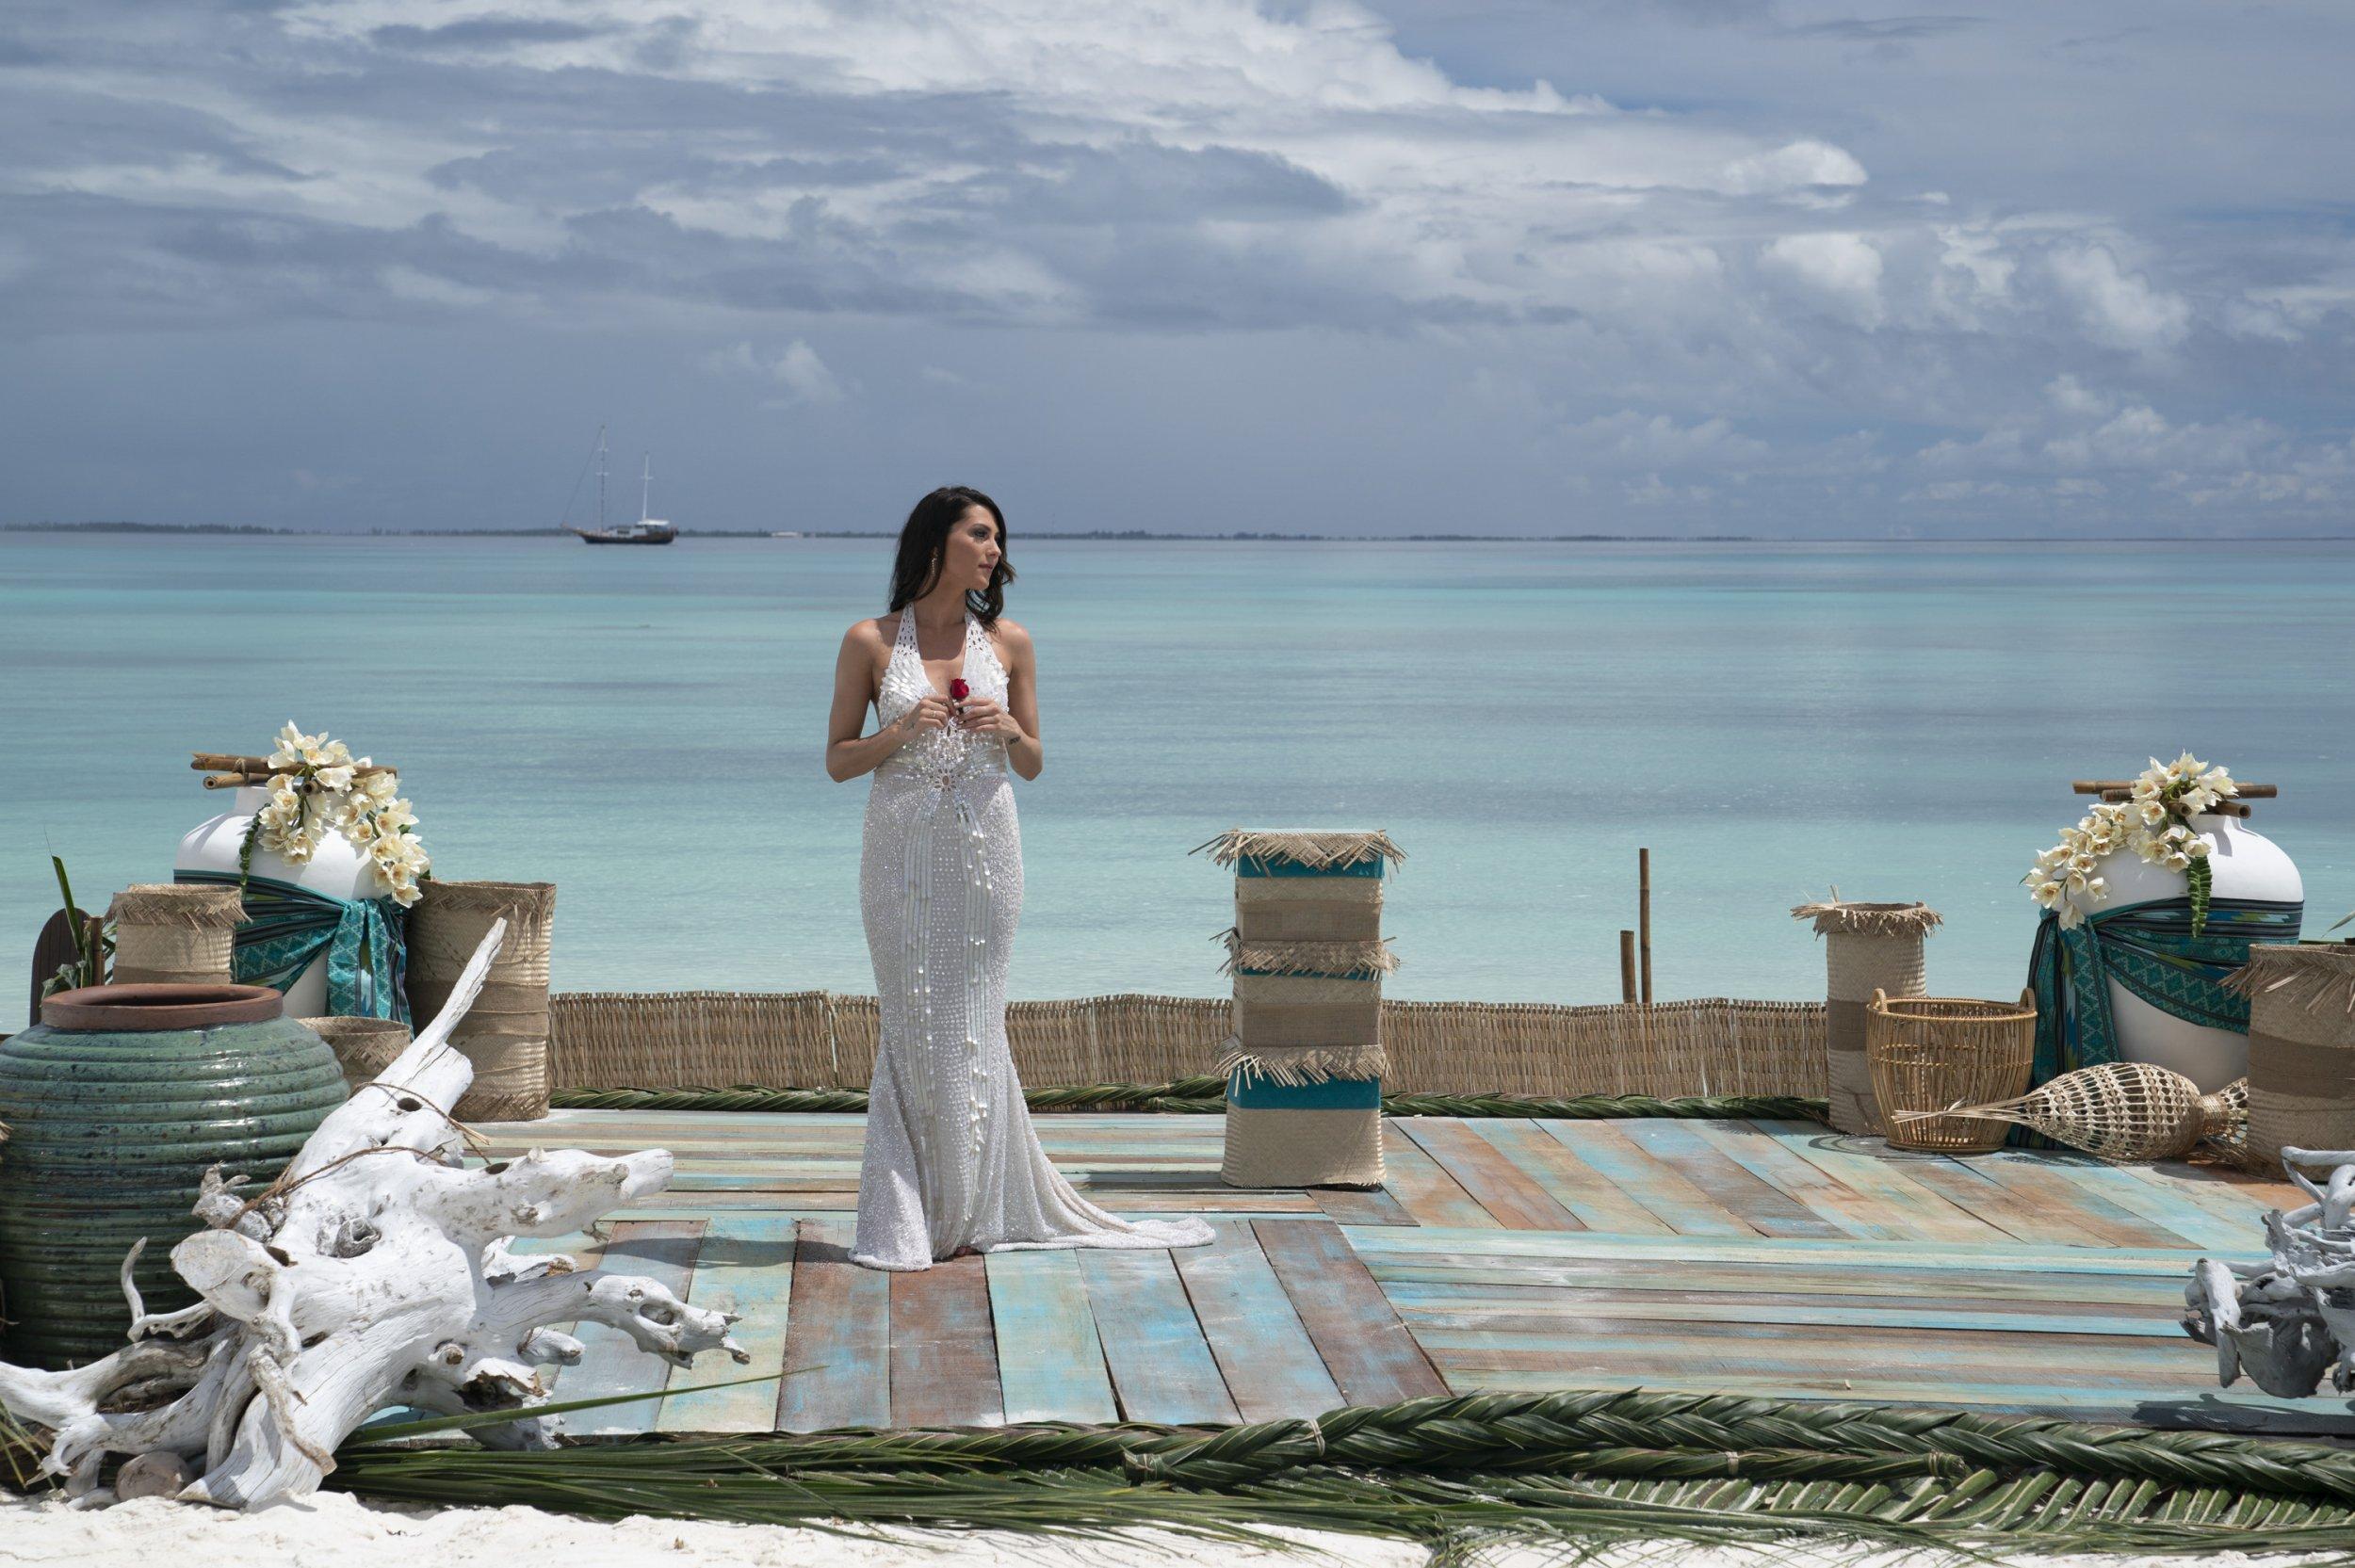 Becca Kufrin Chooses Fiancé on 'The Bachelorette'